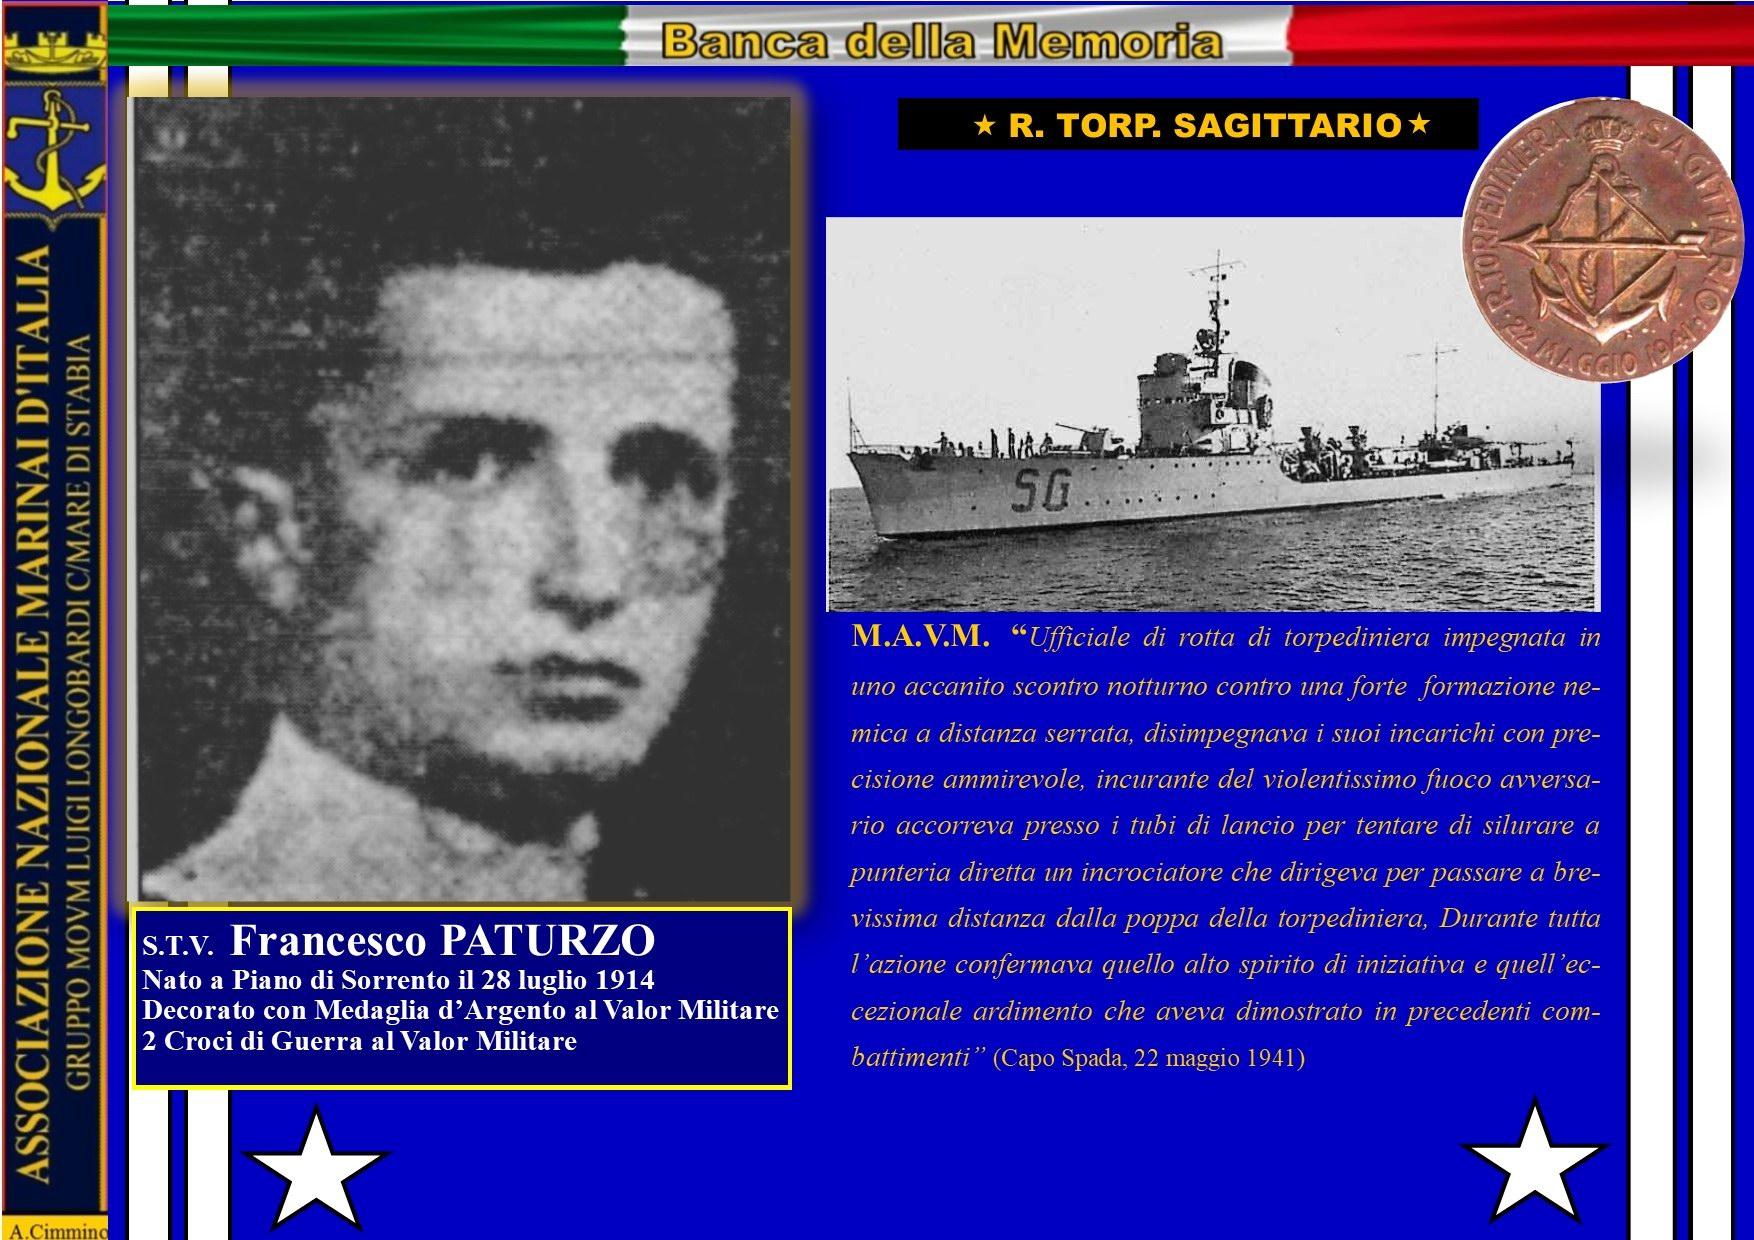 Paturzo Francesco